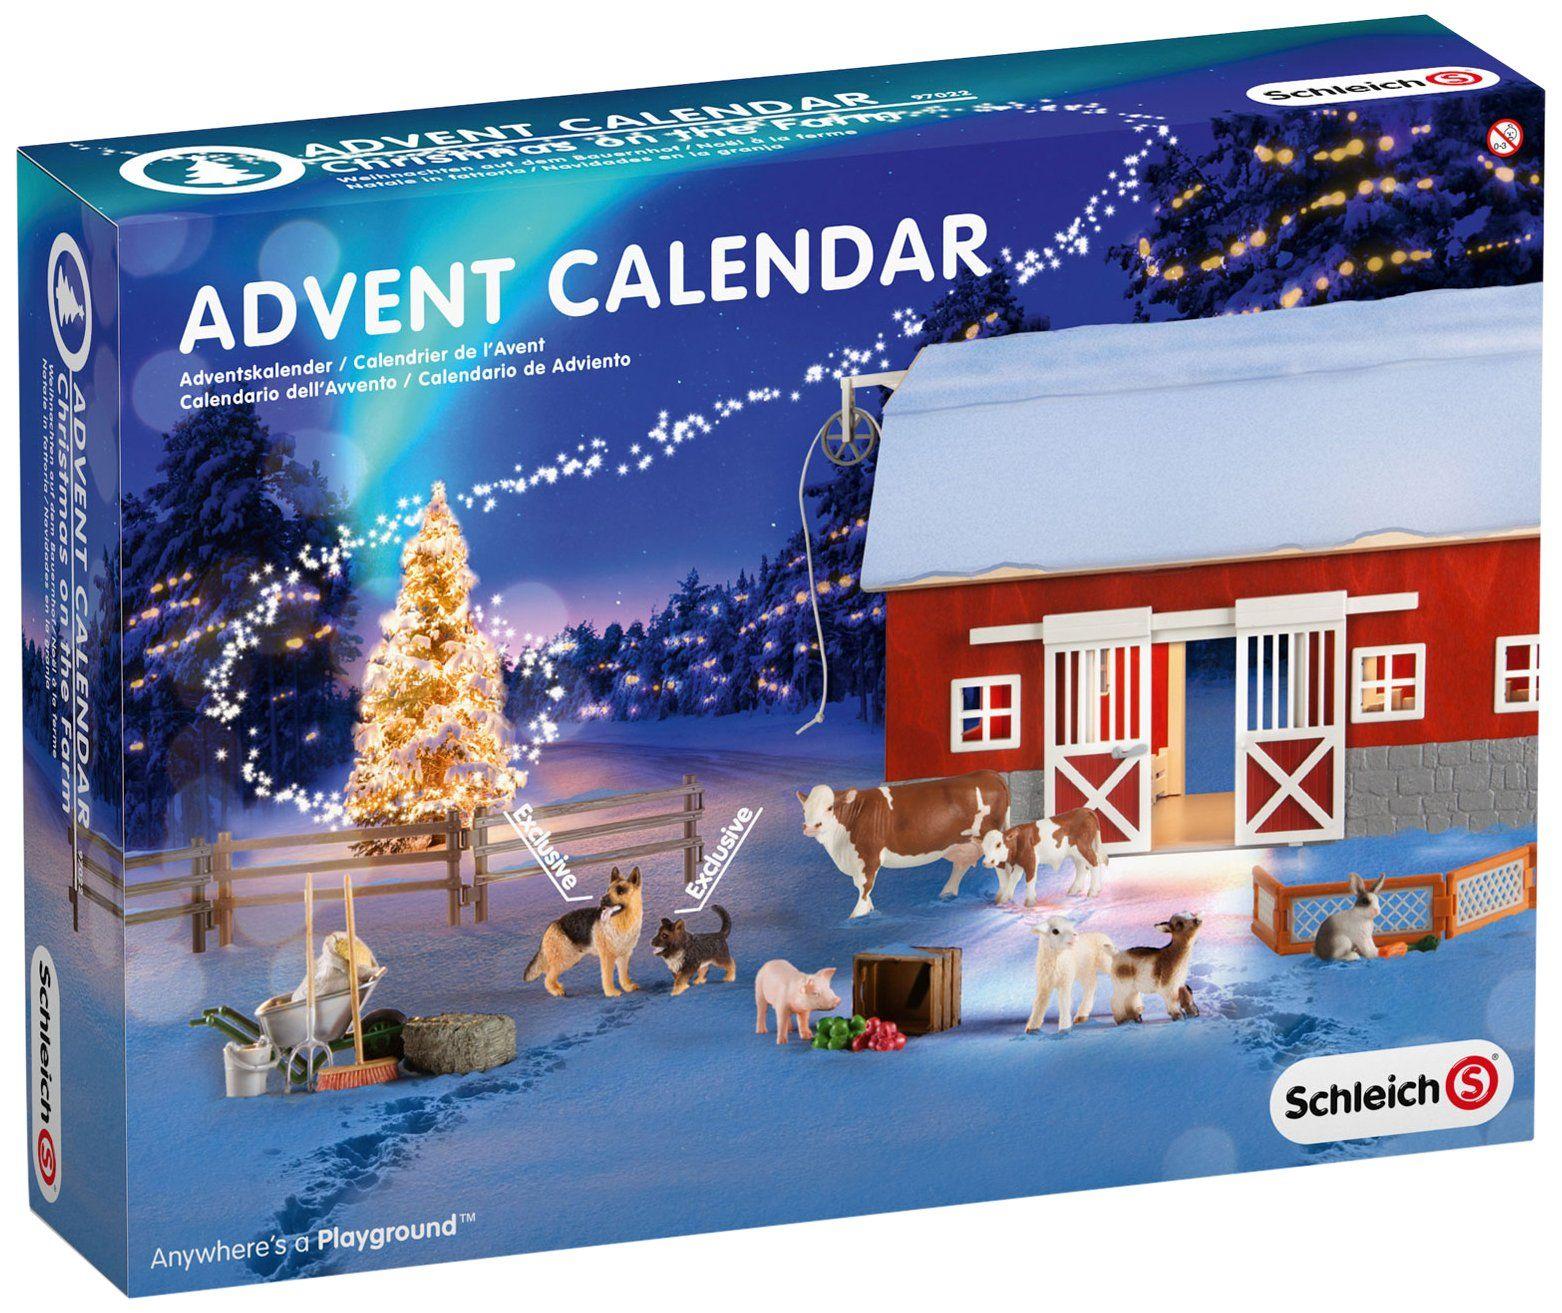 Schleich Weihnachtskalender.Amazon Com Schleich Christmas On The Farm Advent Calendar Set Toys